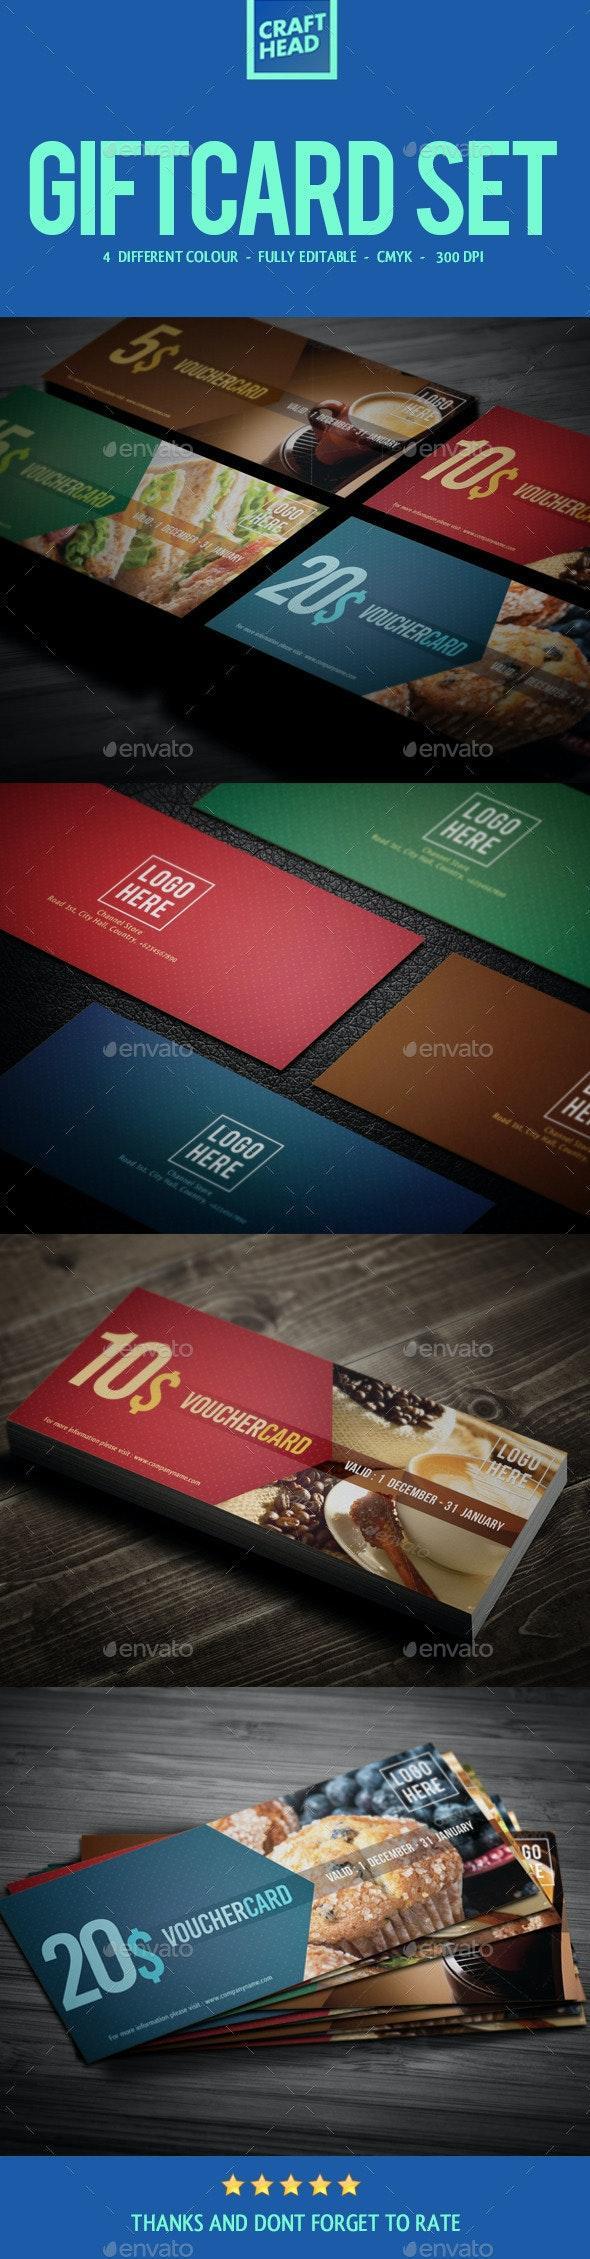 Food Gift Voucher Set - Cards & Invites Print Templates